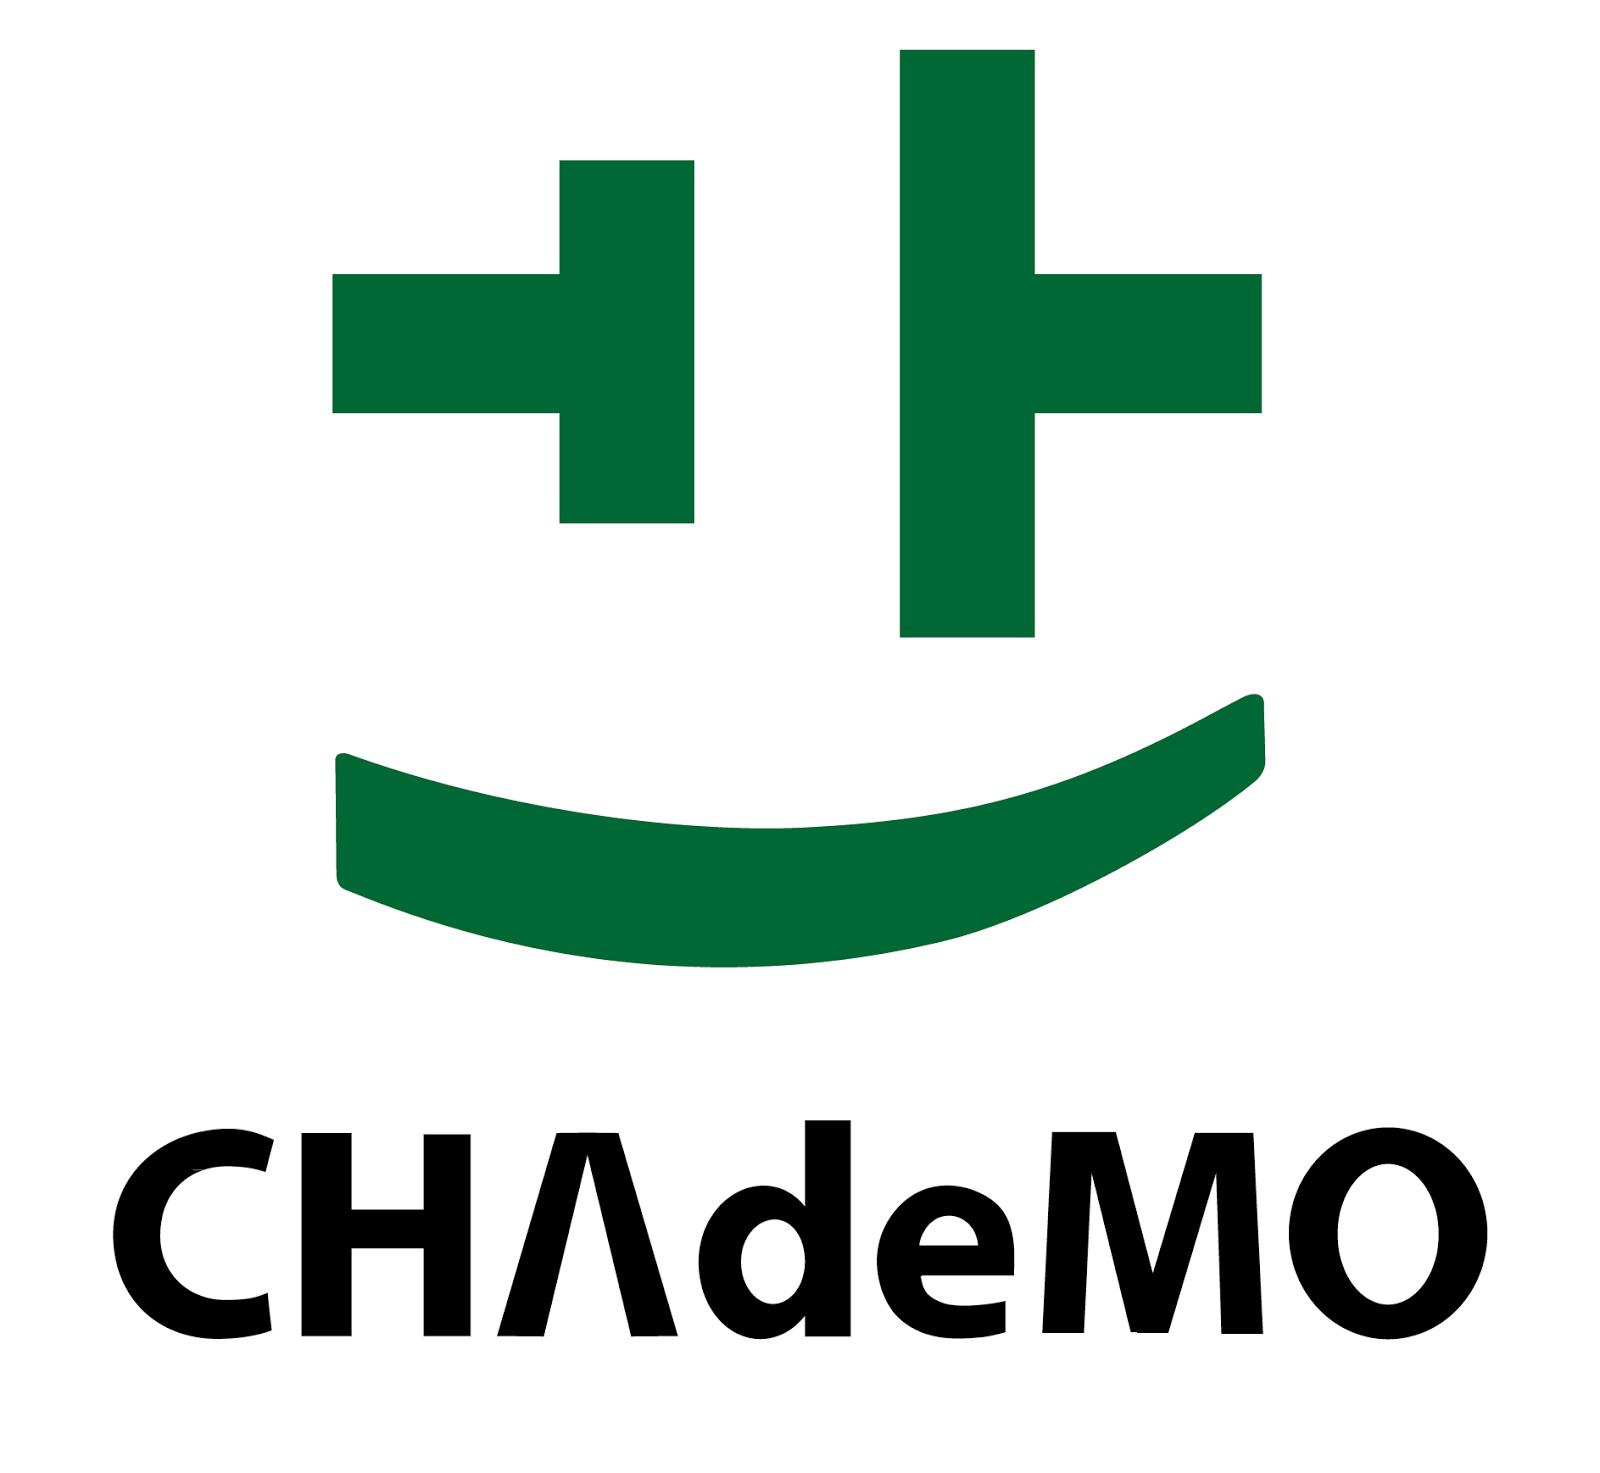 http://www.chademo.com/wp/